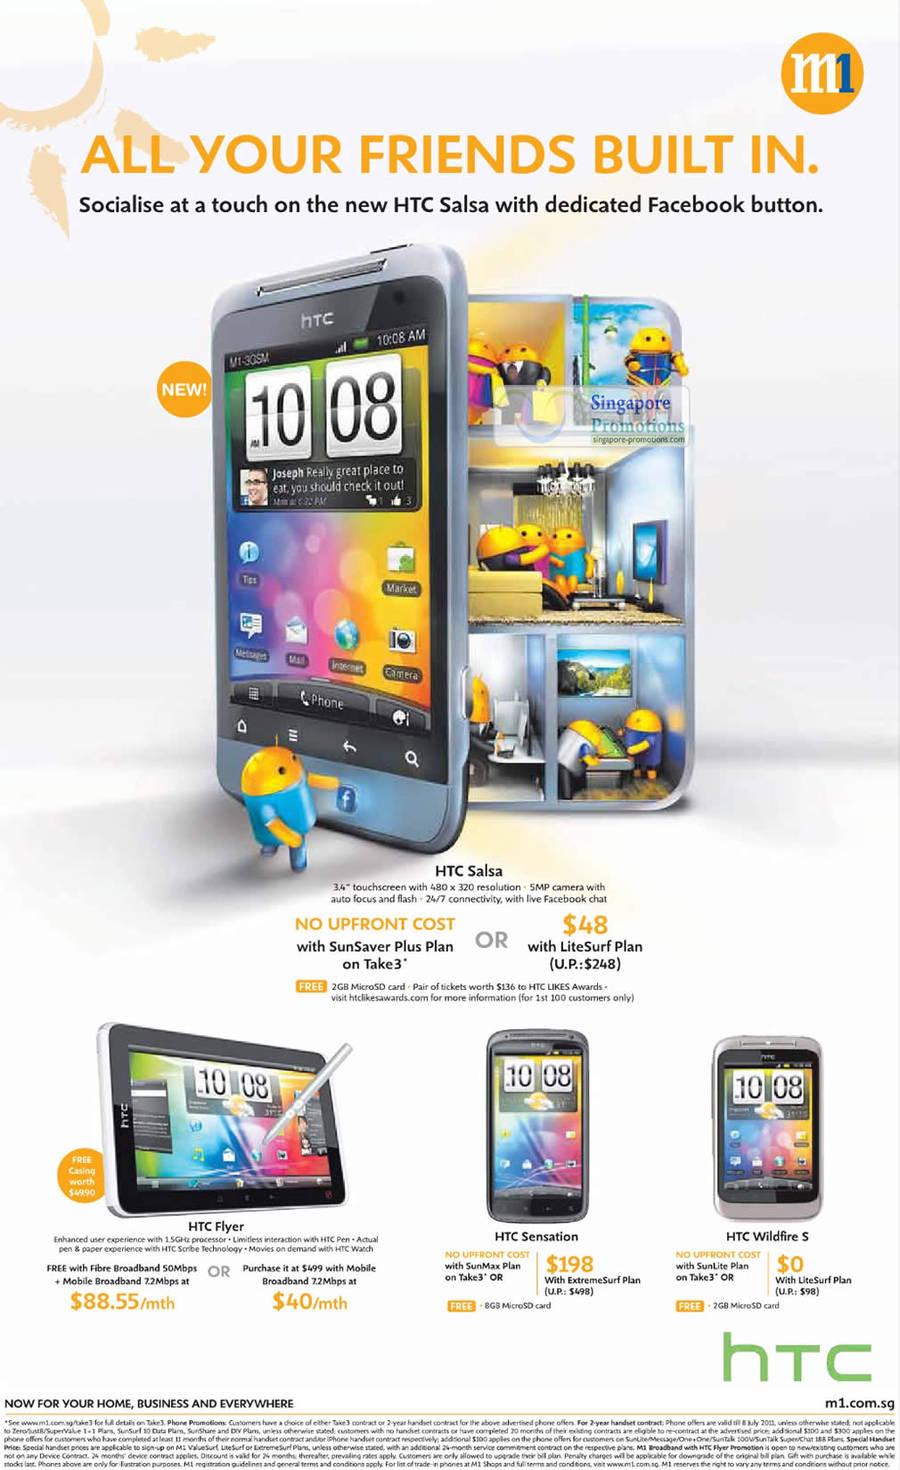 HTC Salsa, HTC Flyer, HTC Sensation, HTC Wildfire S